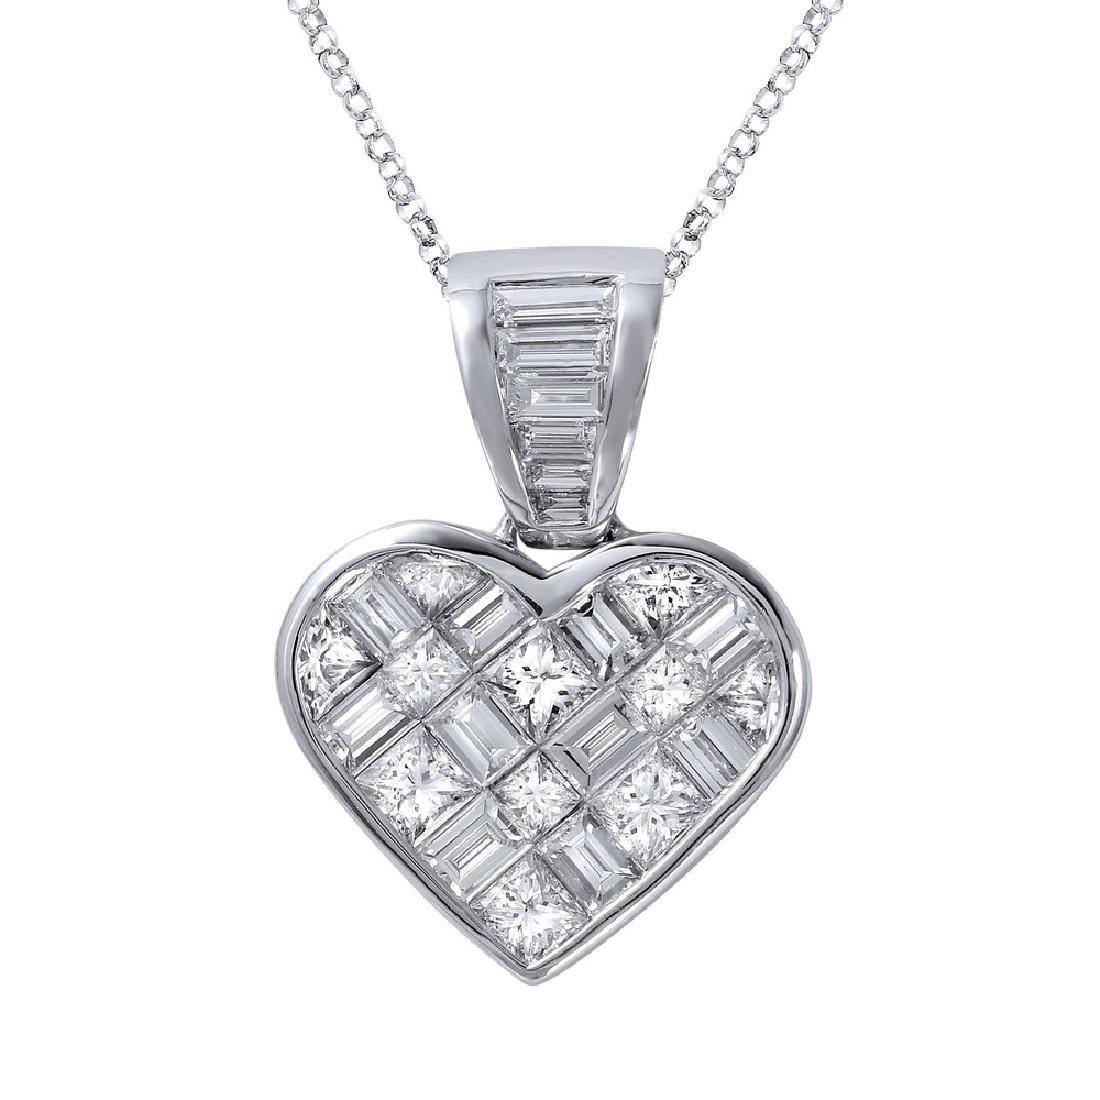 Genuine 5.16 TCW 14K White Gold Ladies Necklace